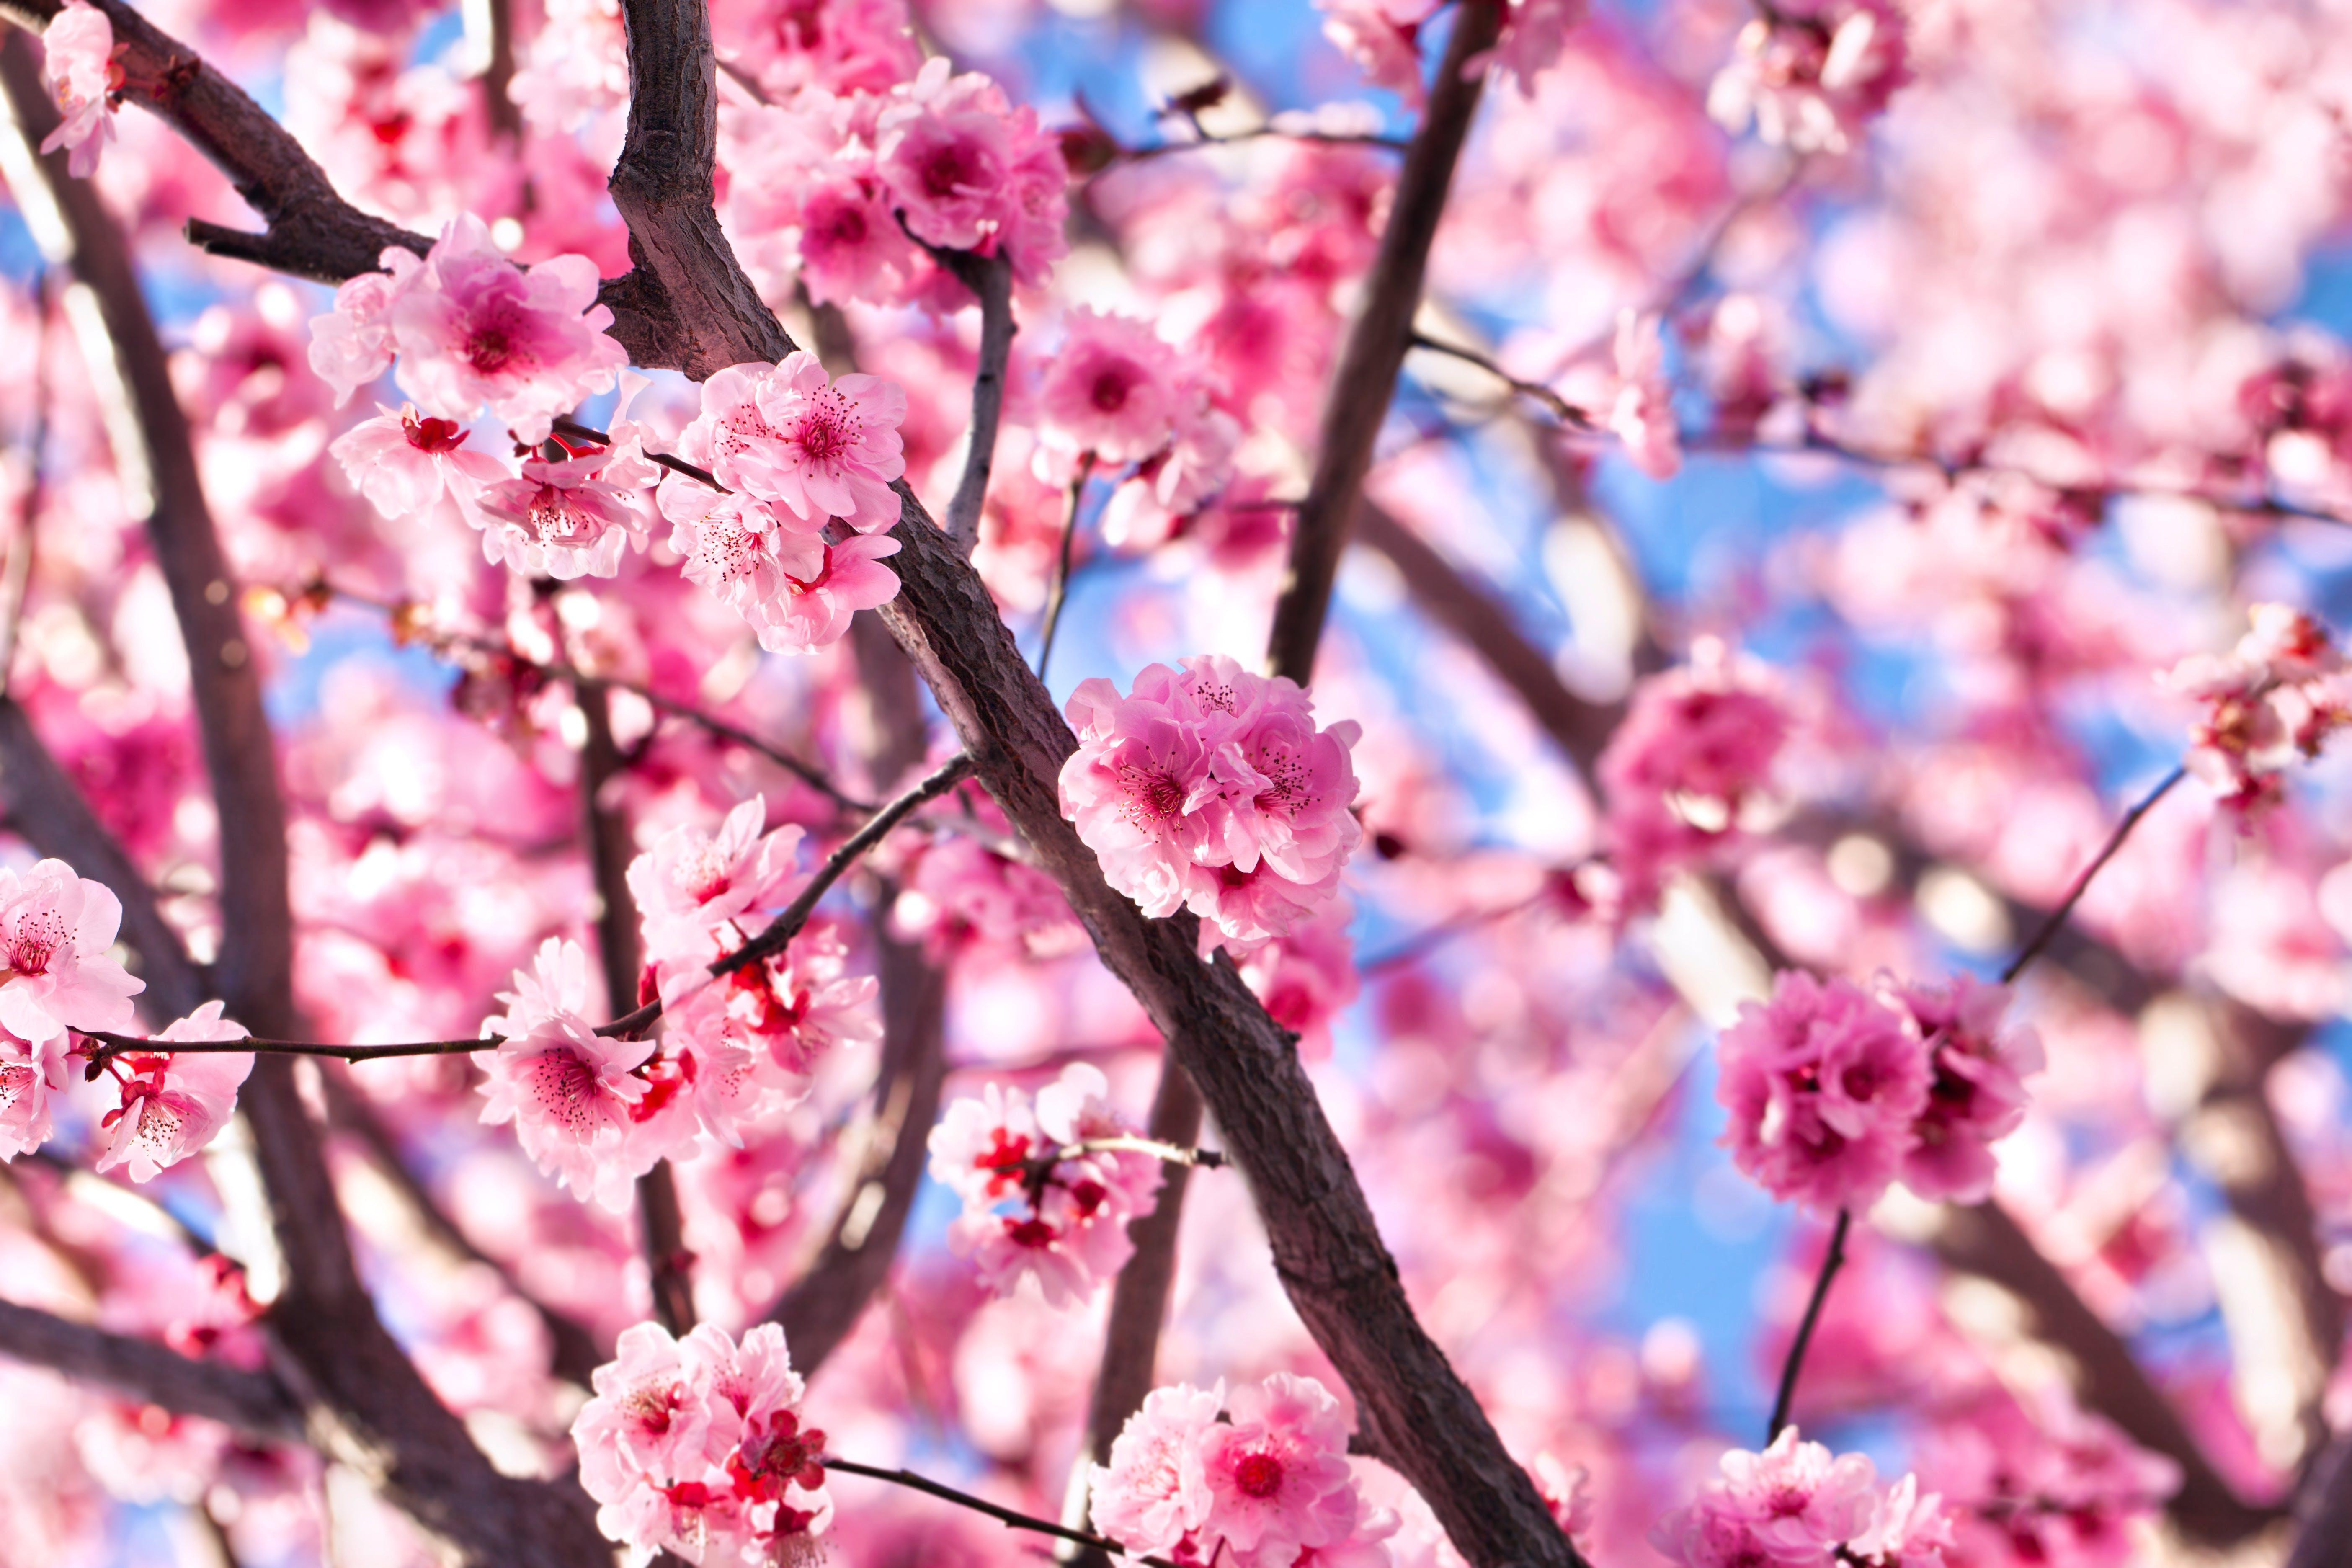 Japan in full bloom